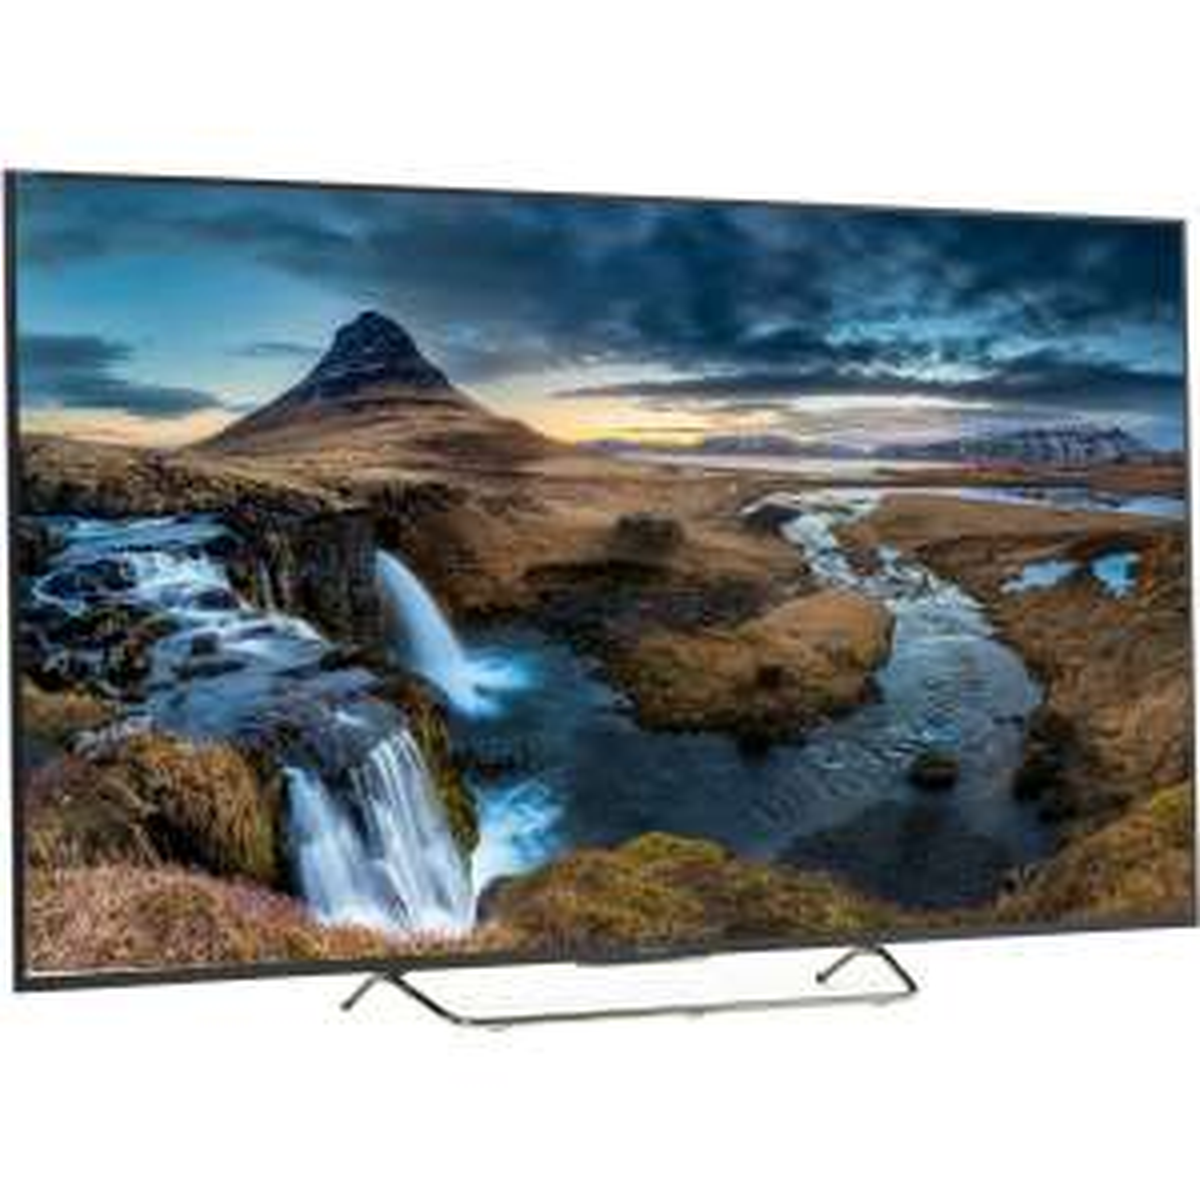 "TV LED 65"" Sony KDL65W859C - 1000 Hz, Smart TV, 3D"